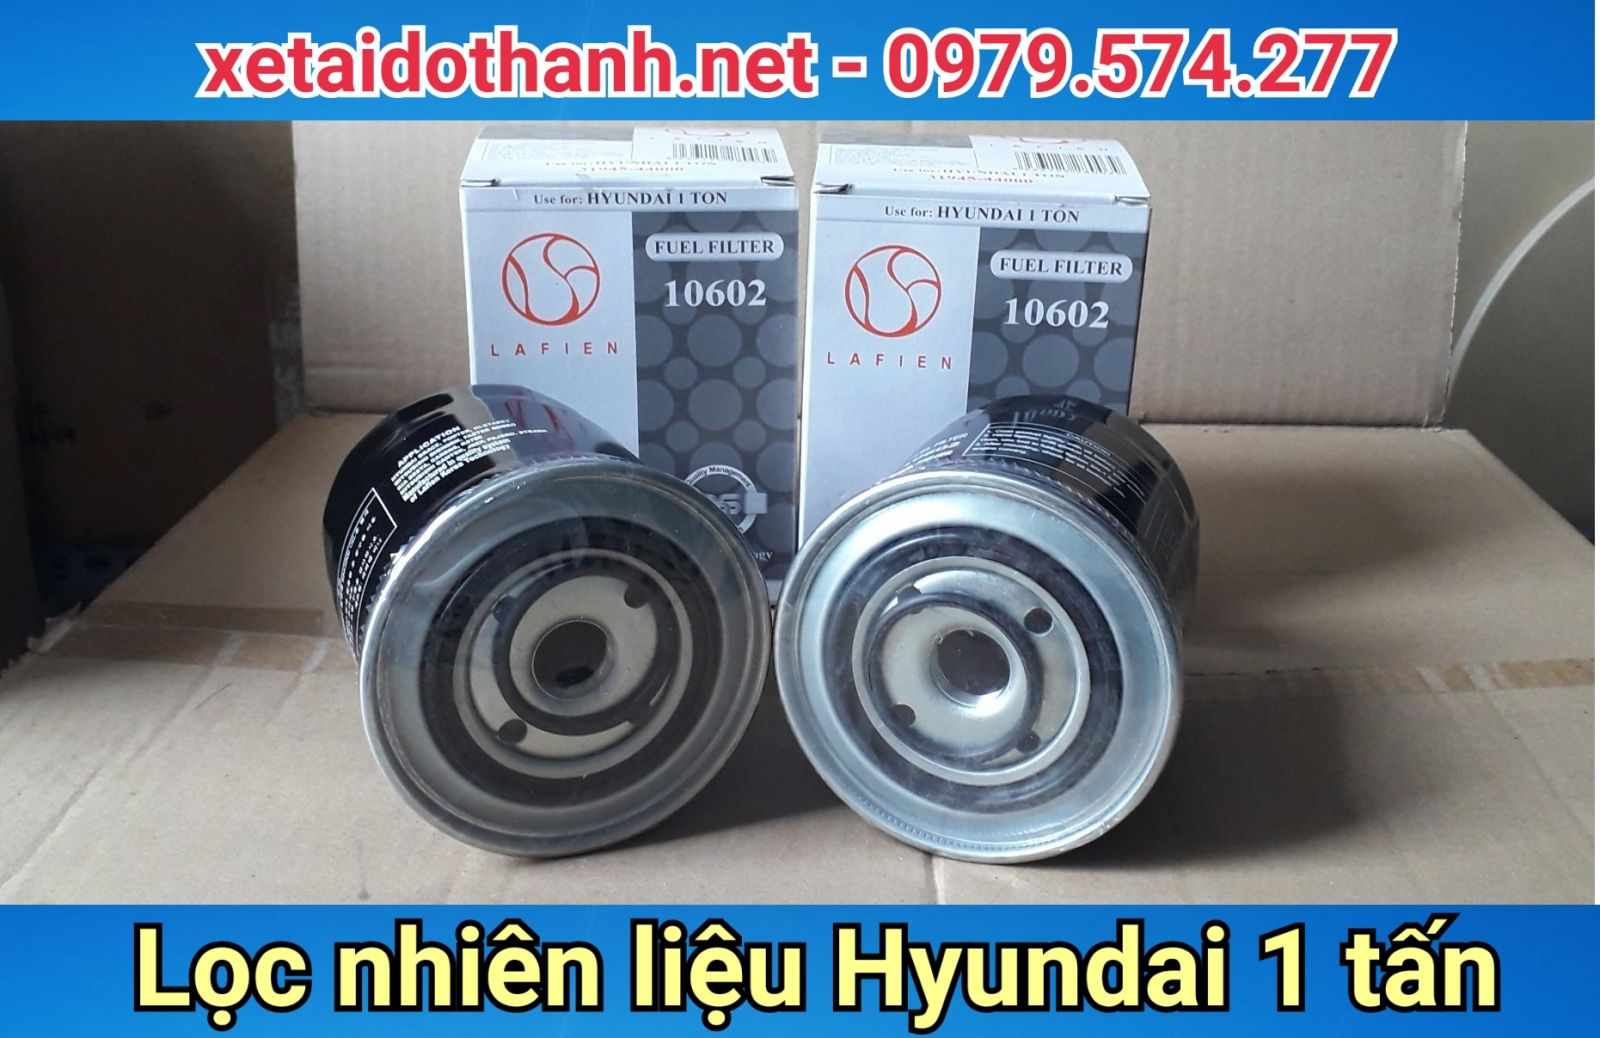 Lọc nhiên liệu xe Hyundai 1 tấn